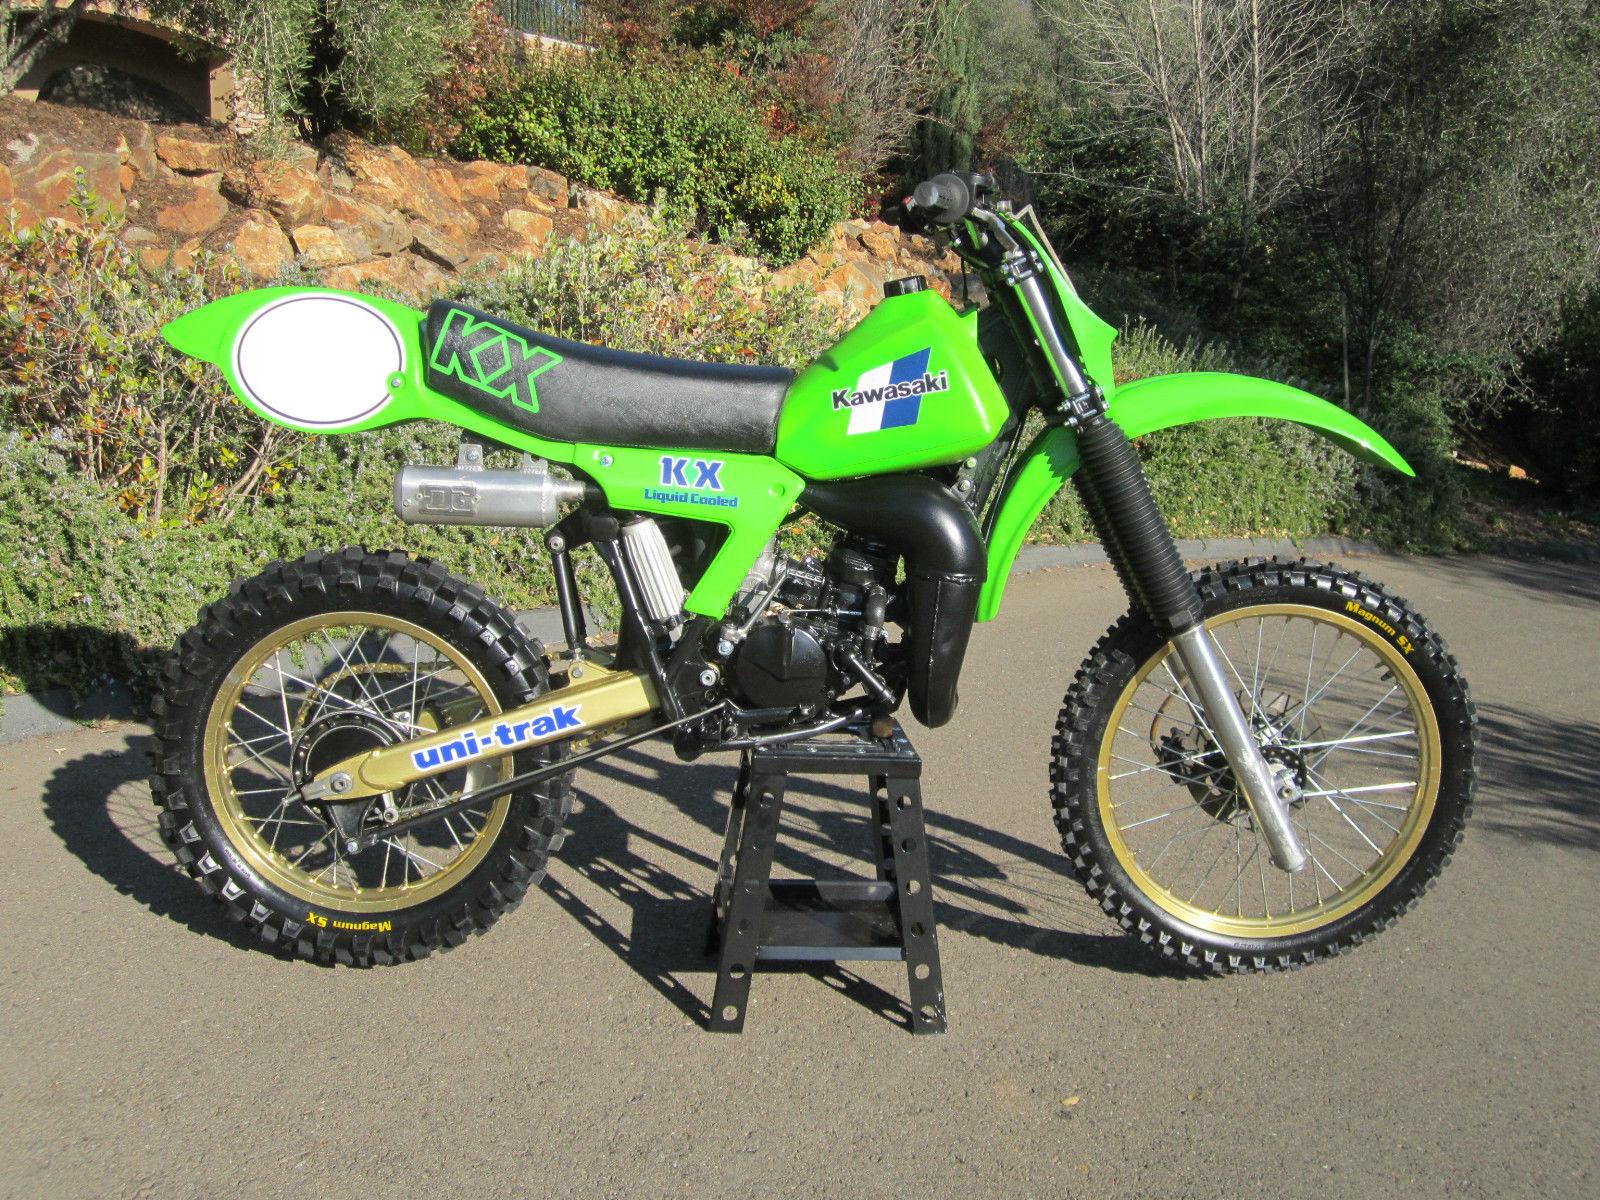 82 Kawasaki Kx125 Dirt Bike Motorcycle Ahrma Rare